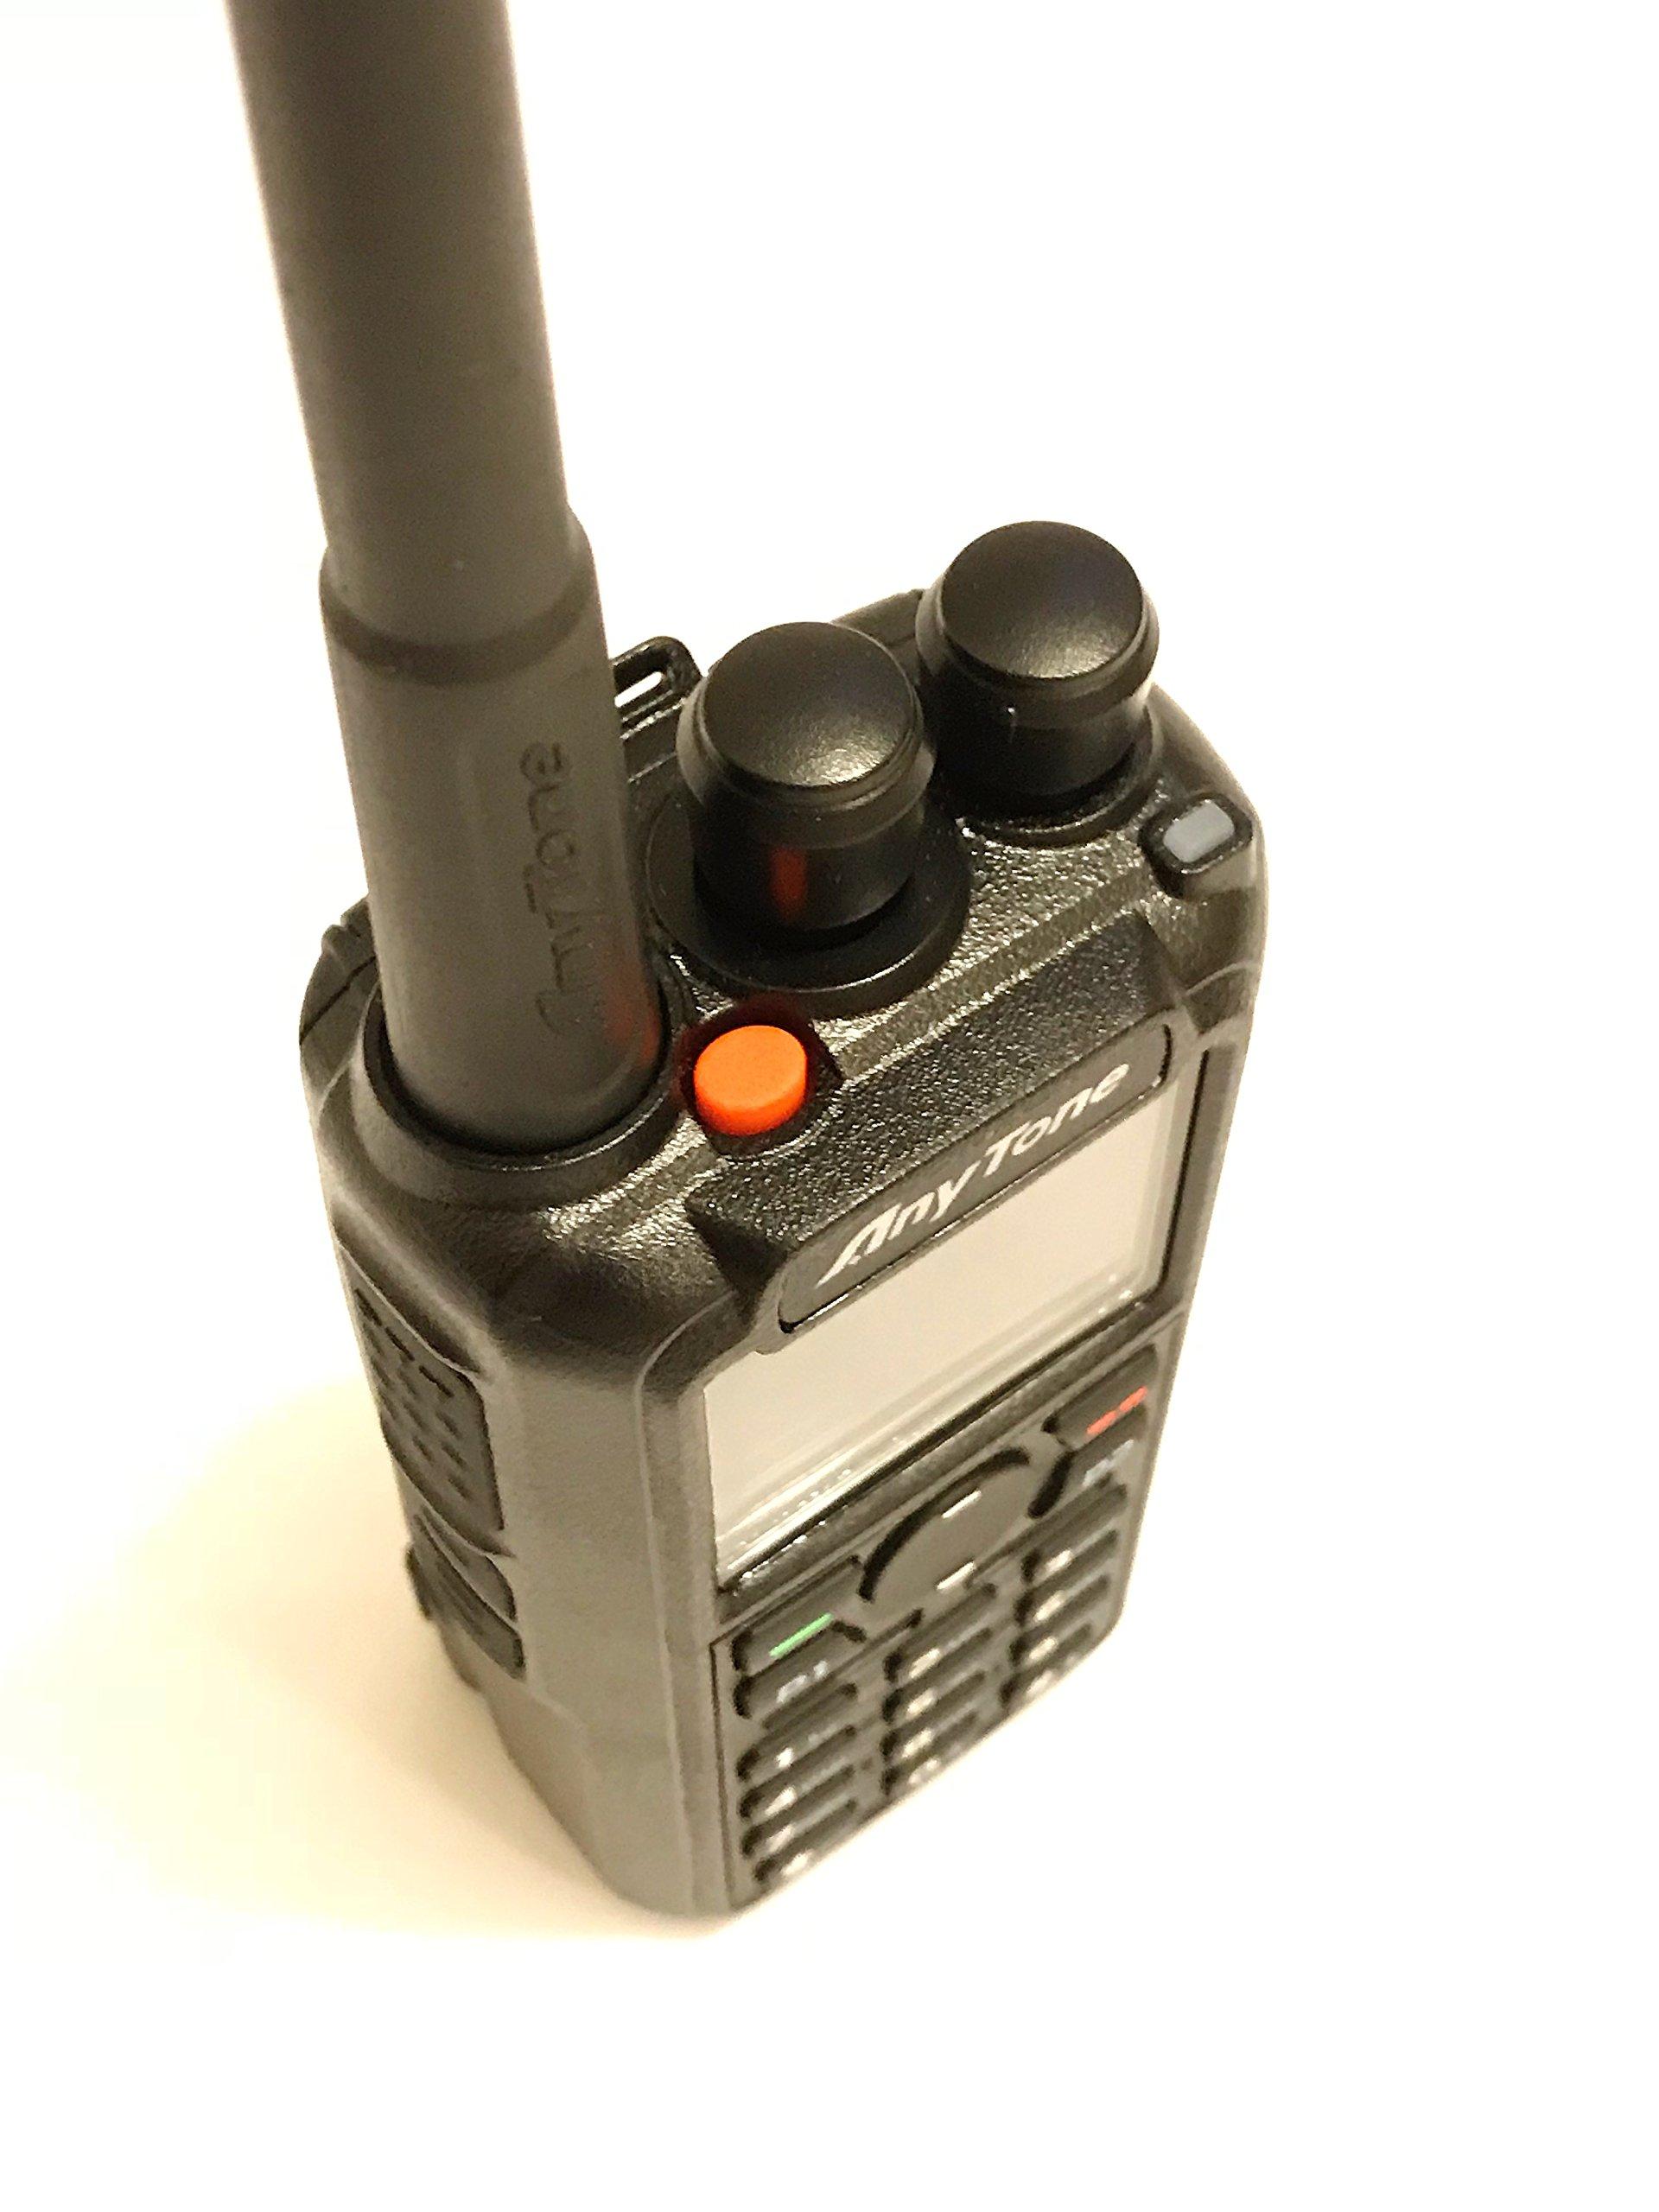 AnyTone AT-D868UV GPS Version II Upgraded 3100mAh battery Dual Band DMR/Analog 144 & 430 MHz Radio US Seller by AnyTone (Image #7)